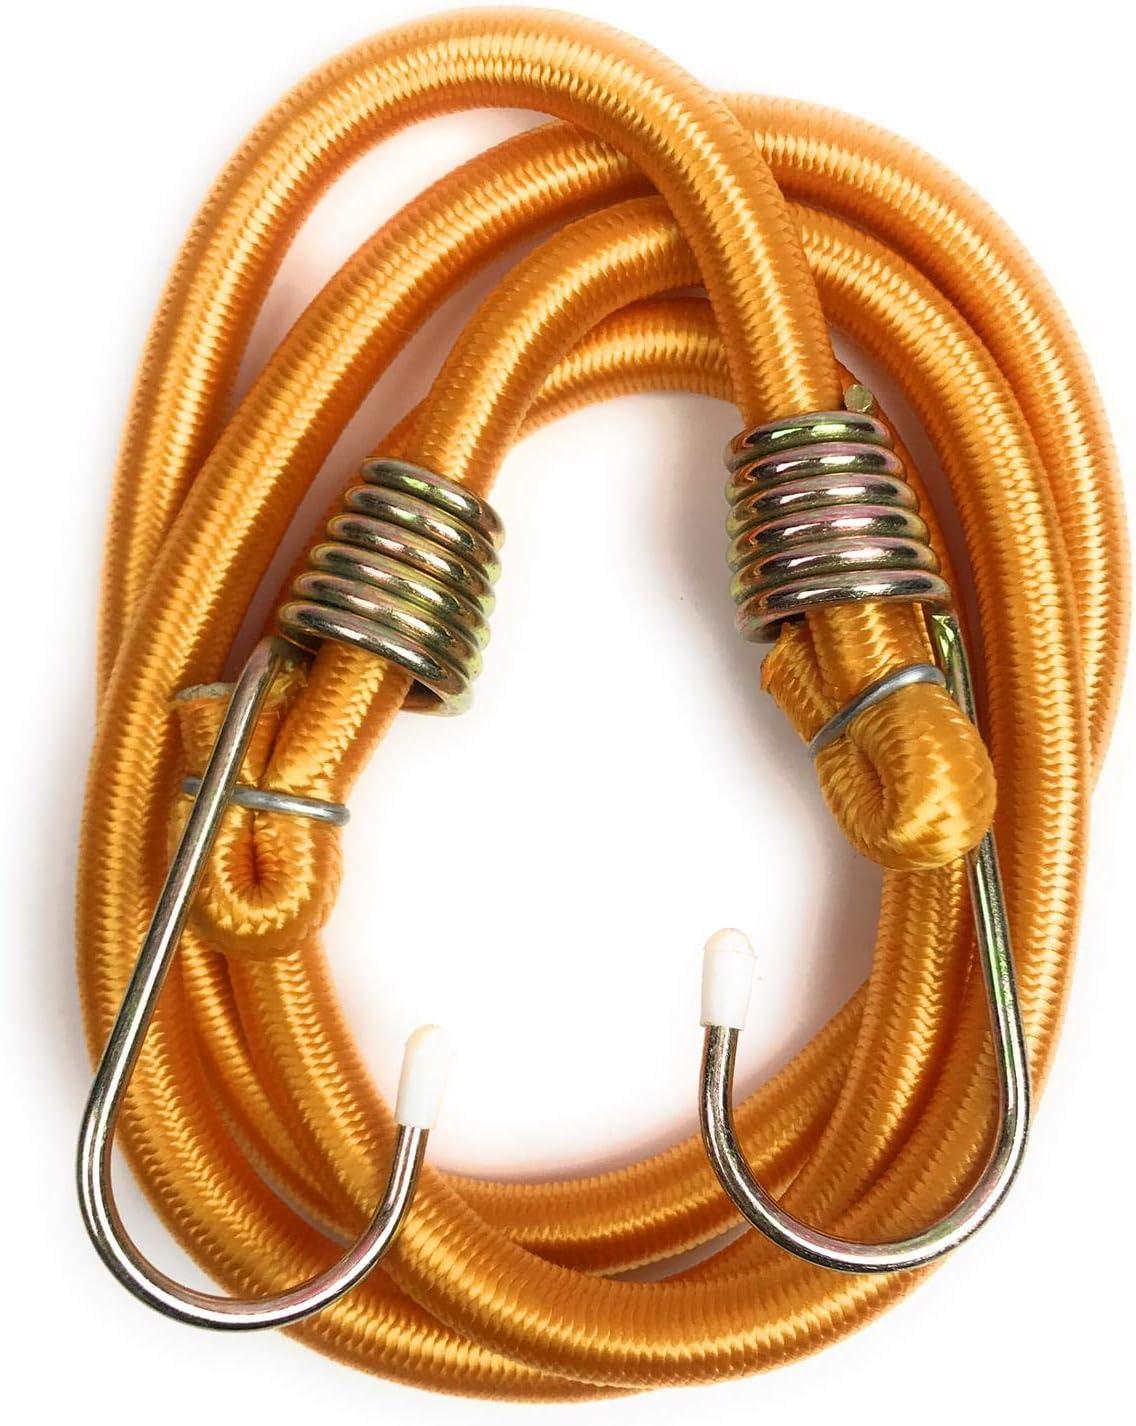 RED, 52 SITARAZ Heavy Duty Elastic BUNGEE CORD 24 /& 52 Travel Luggage Car Roof Stretch Rope UK